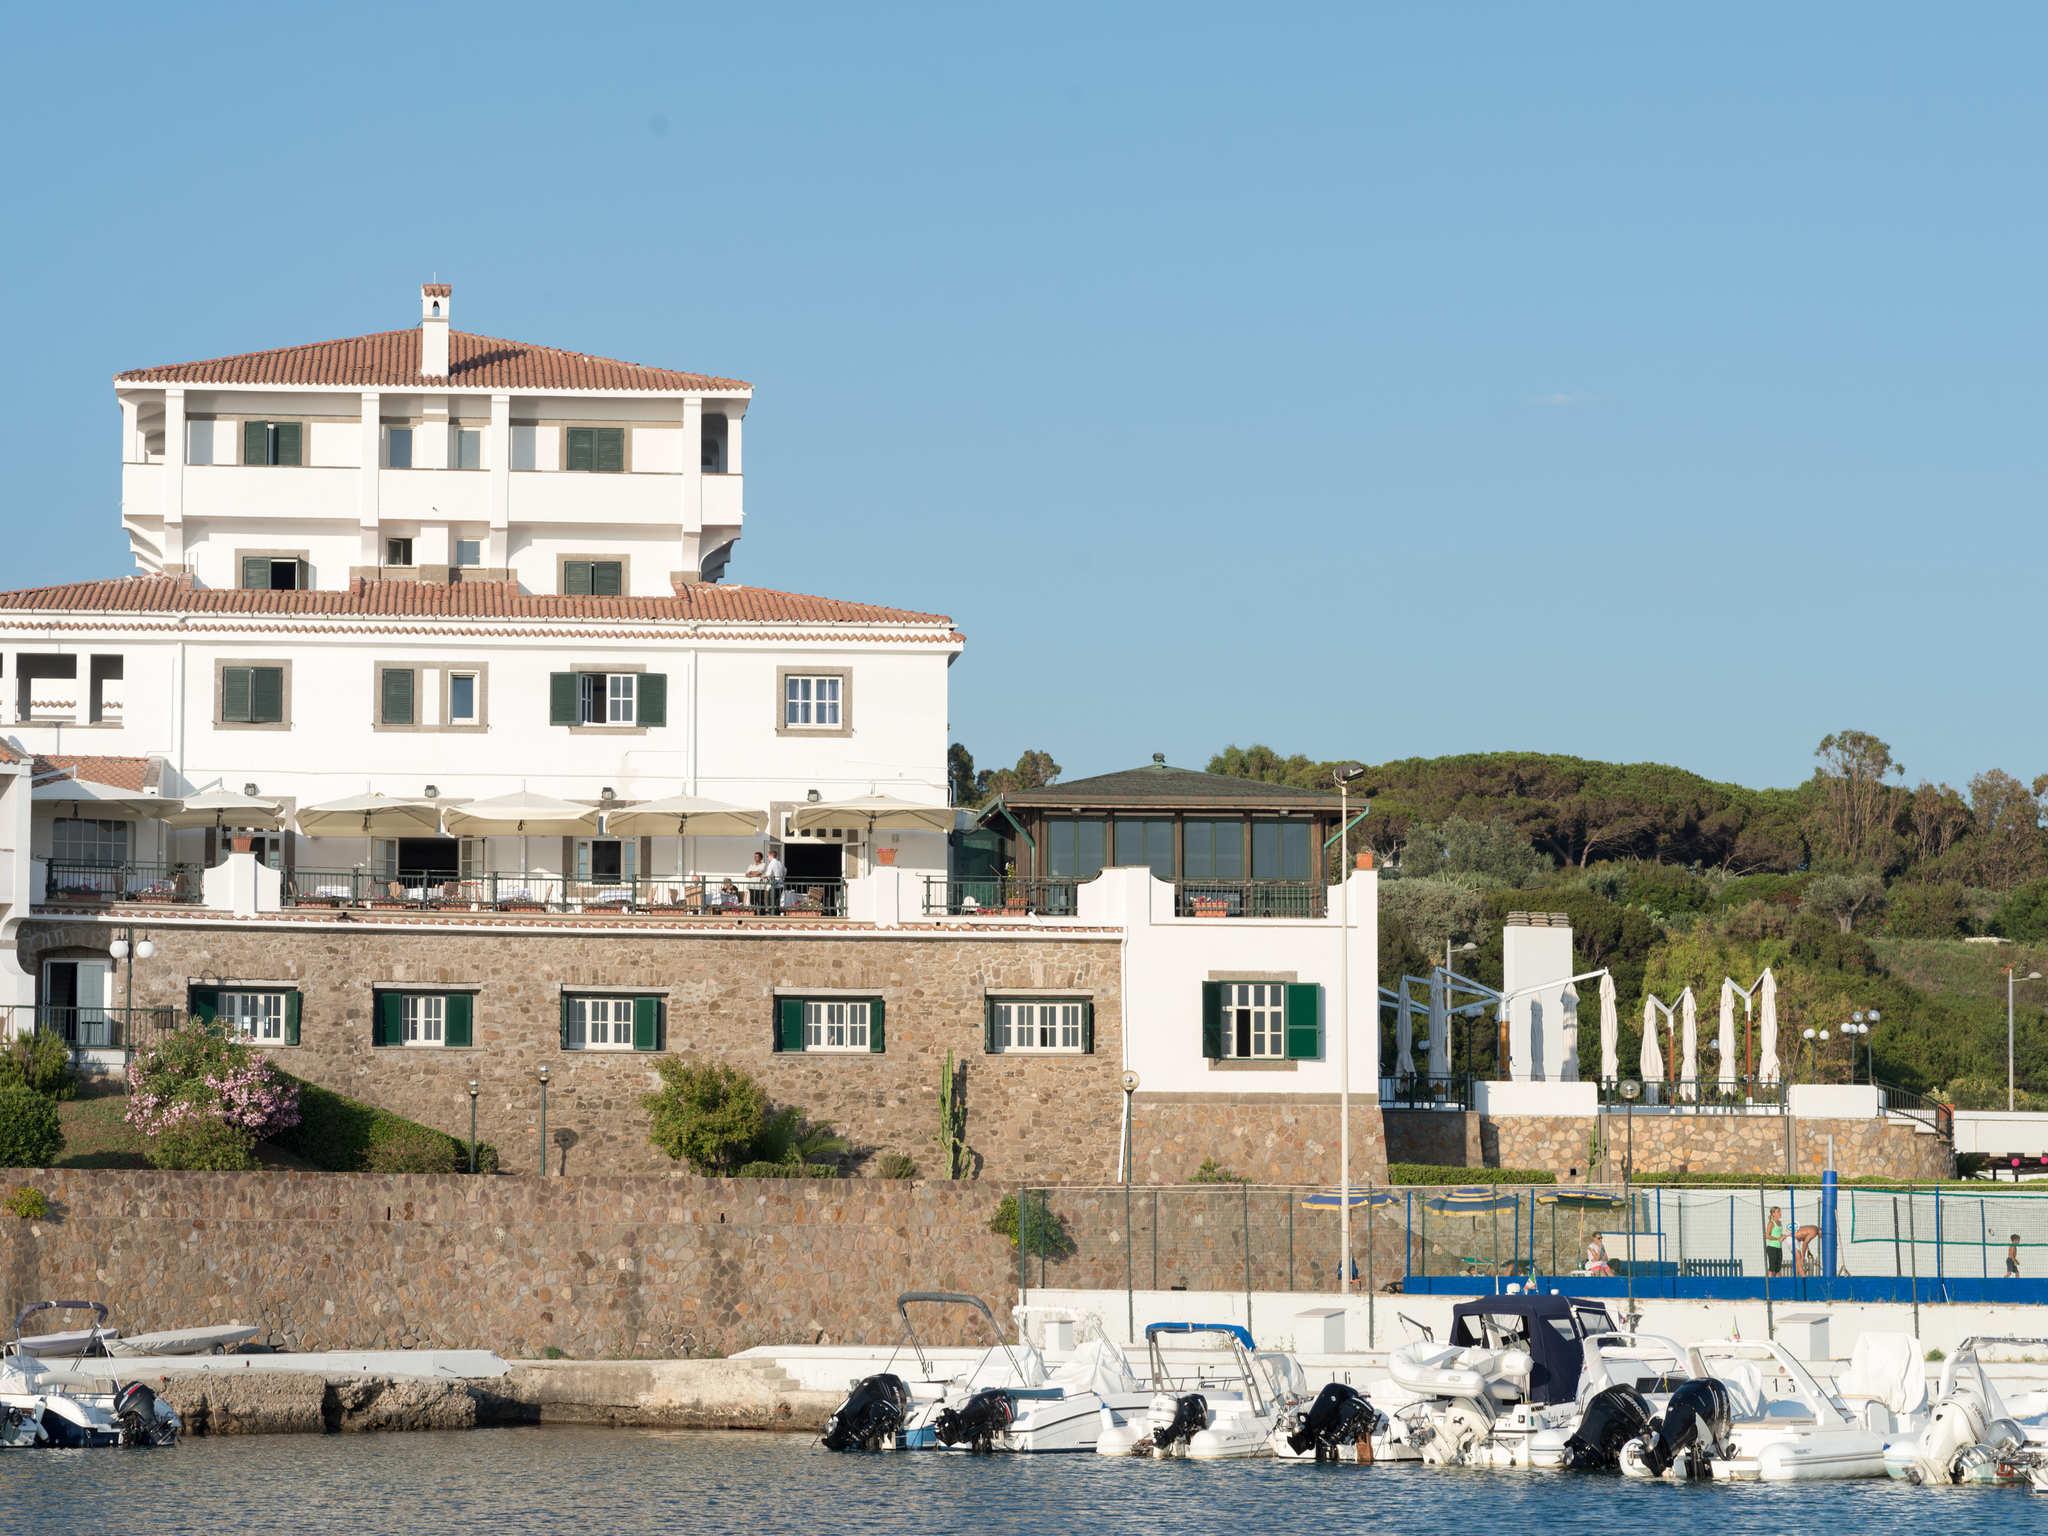 Hotel – Mercure Civitavecchia Sunbay Park Hotel - New Opening